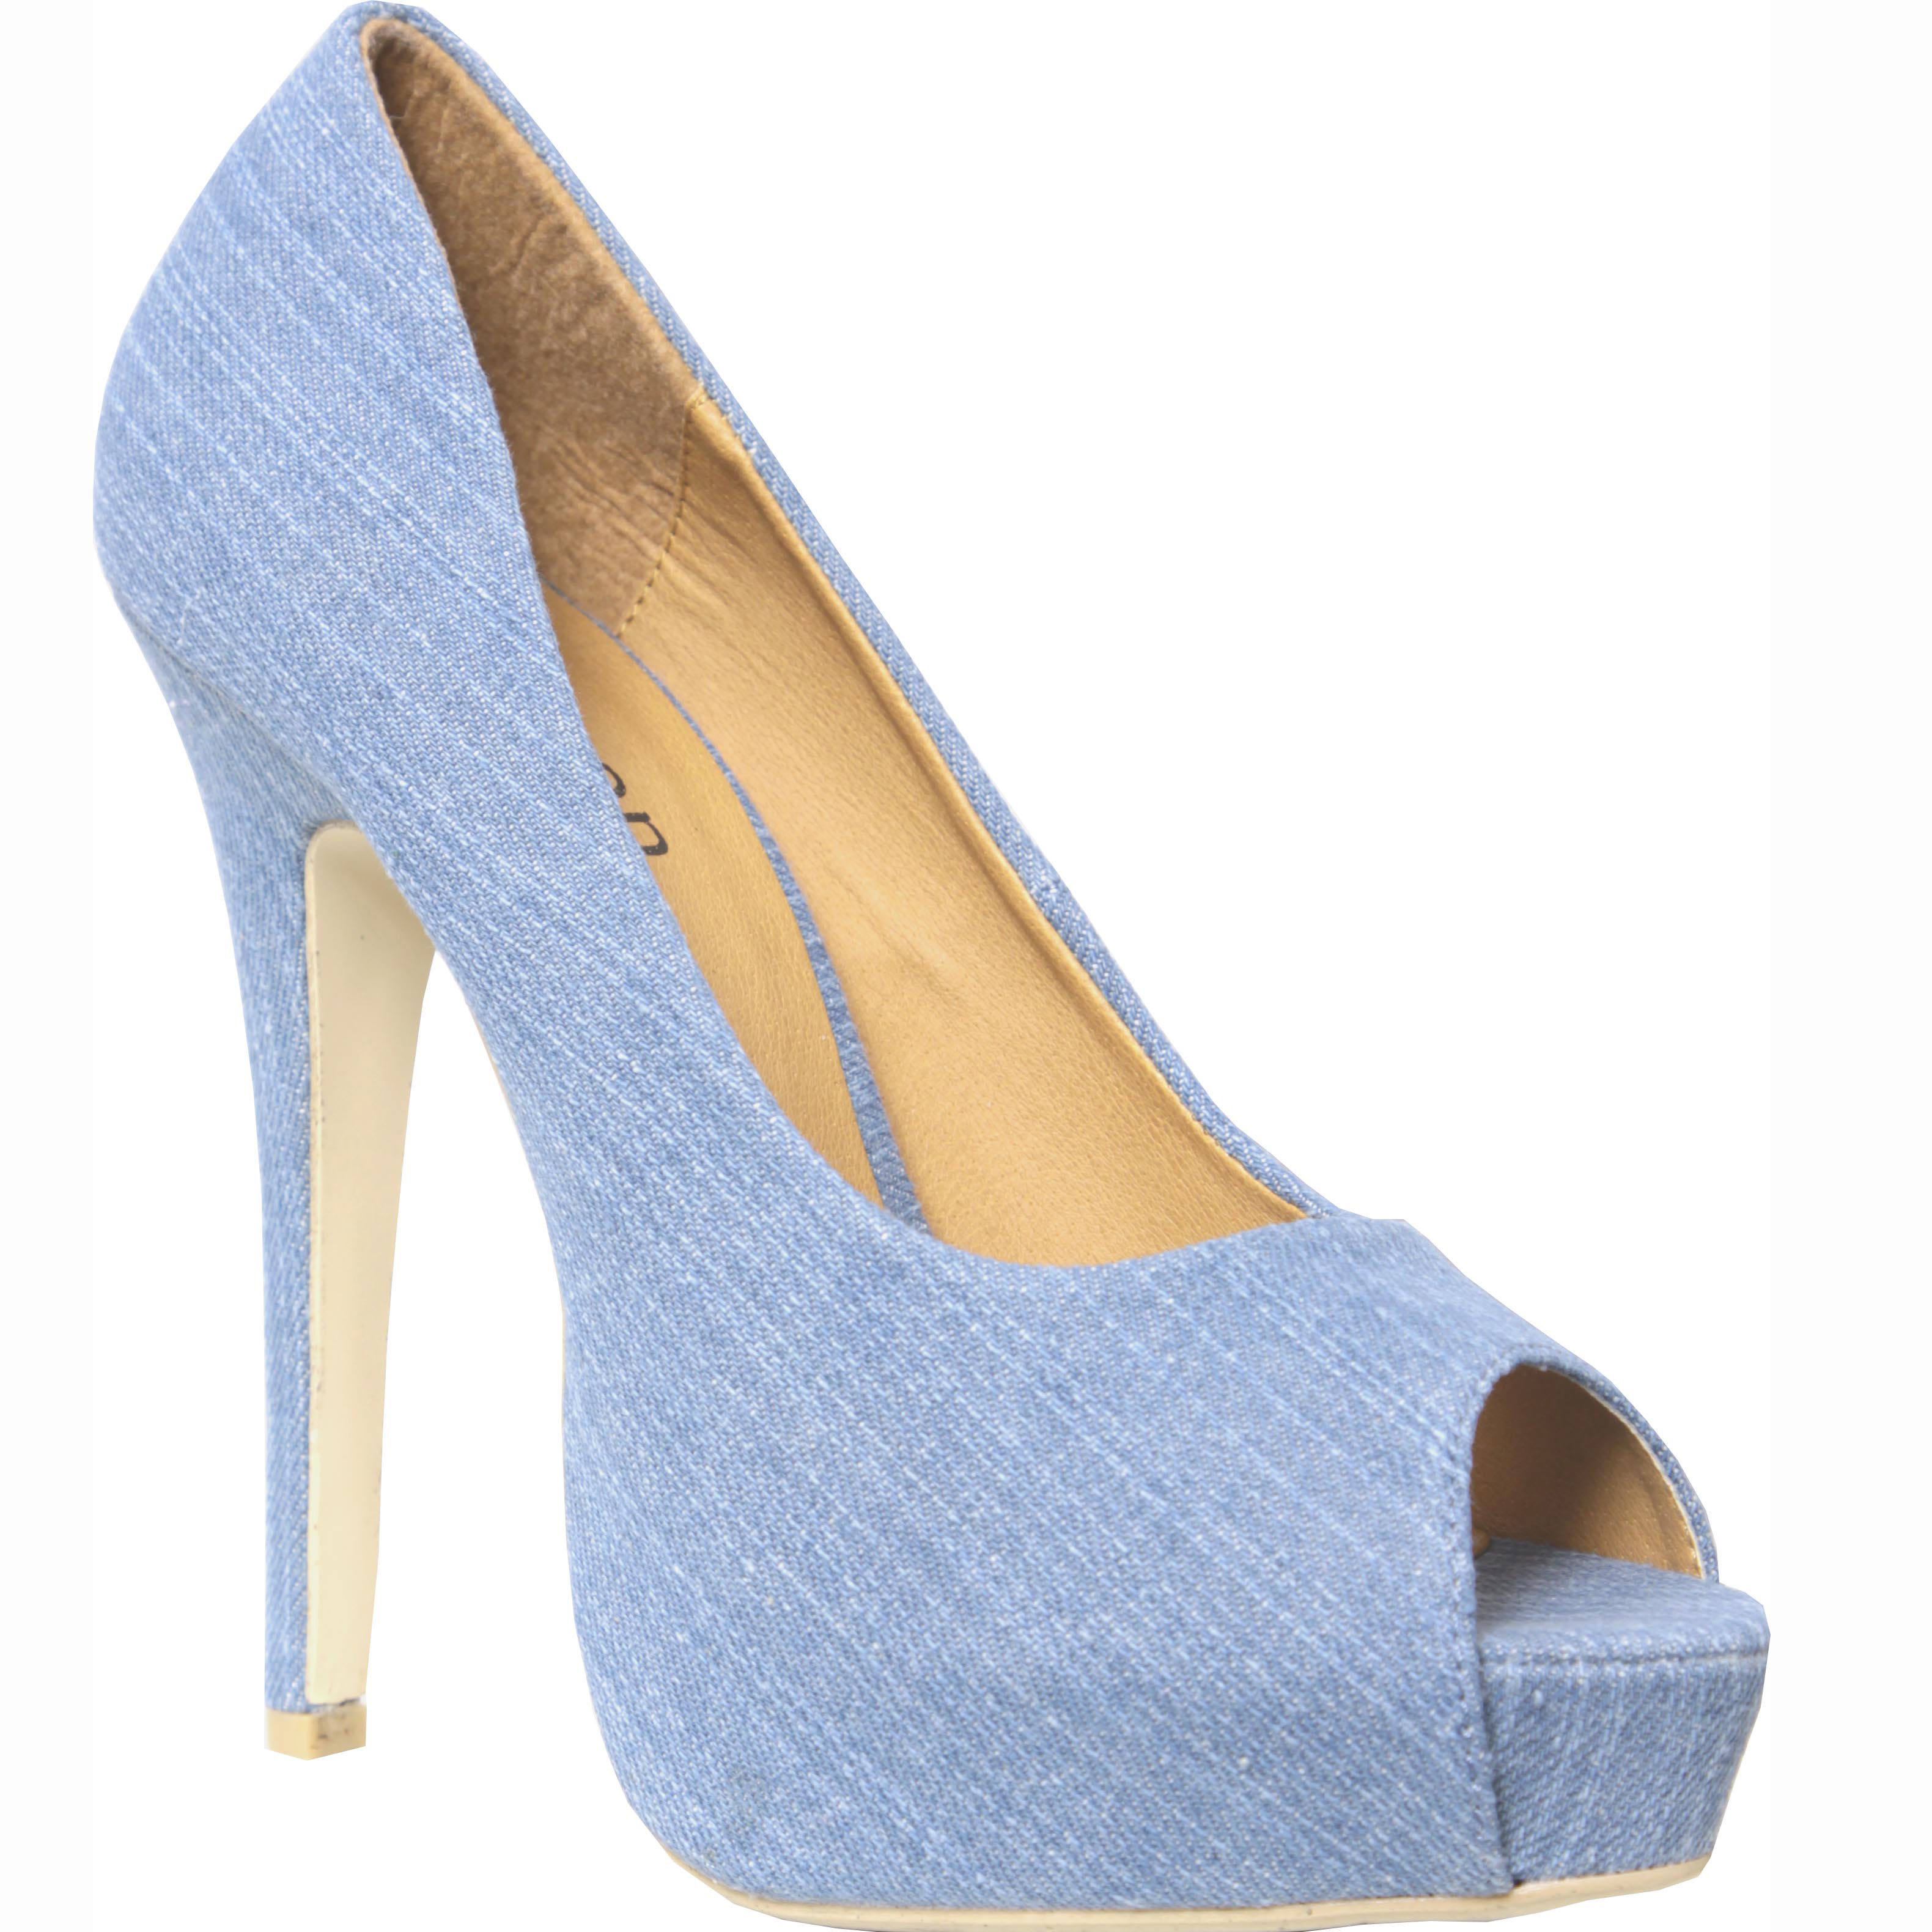 new womens blue denim platform heel shoes sz 4 8